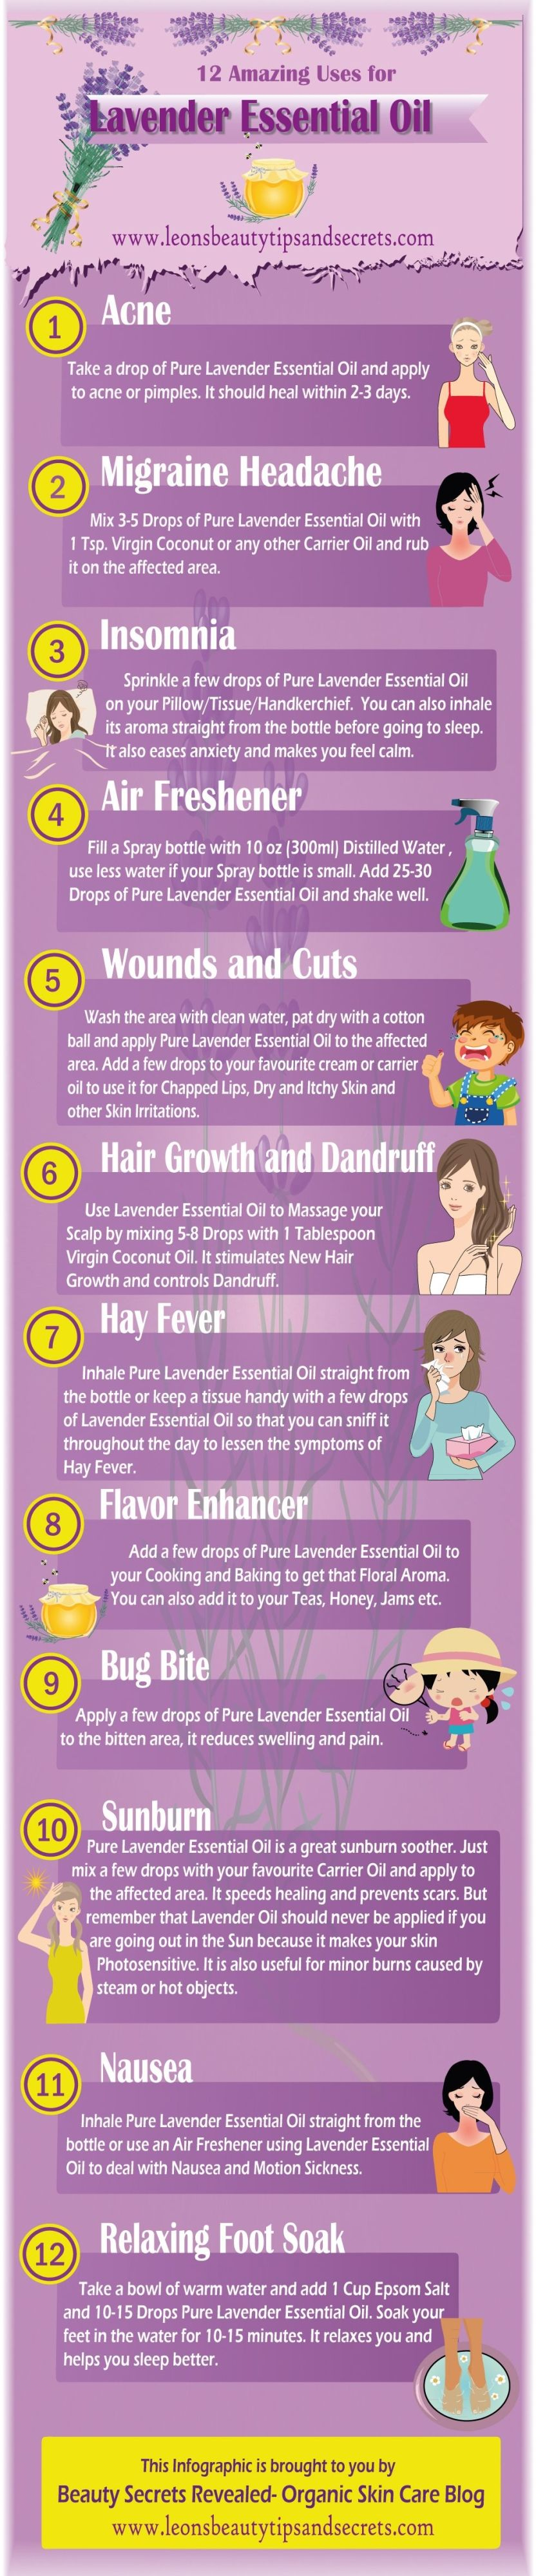 Uses for the Essential Oil Lavender - for more information on essential oils www.facebook.com/yleotks or www.facebook.com/groups/1441031559467944